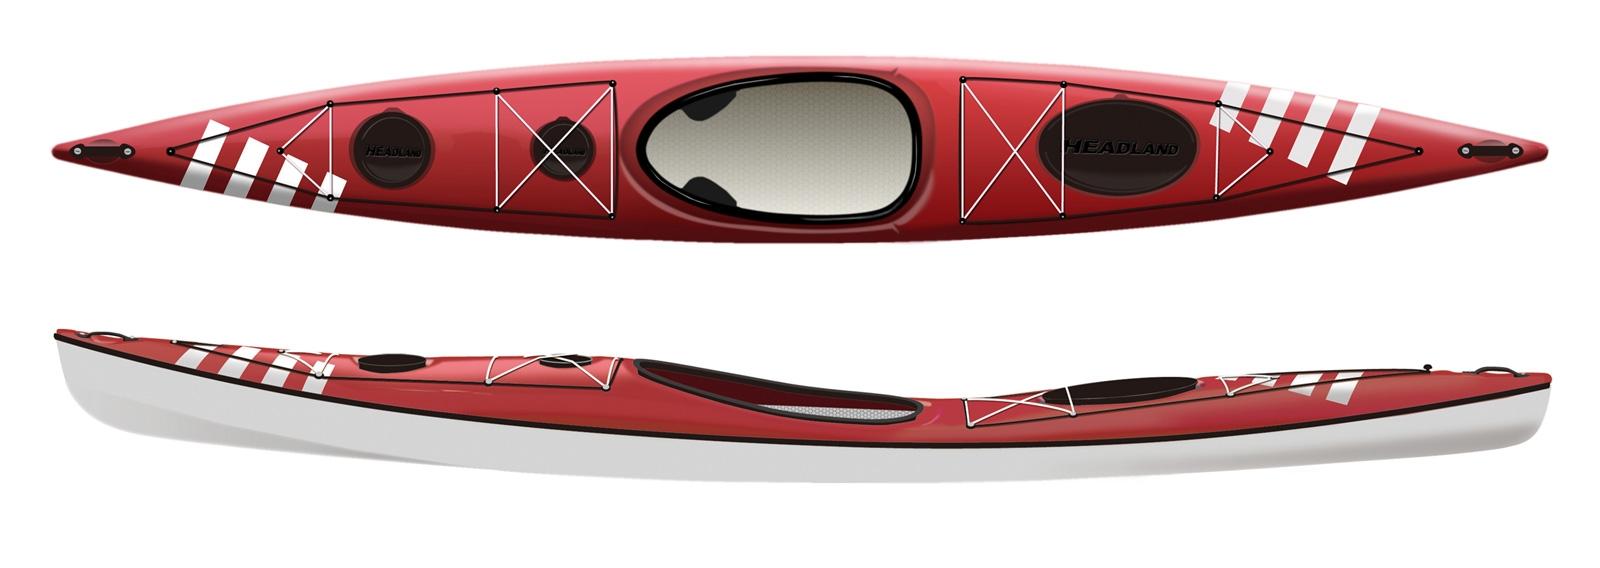 raz14-large-red